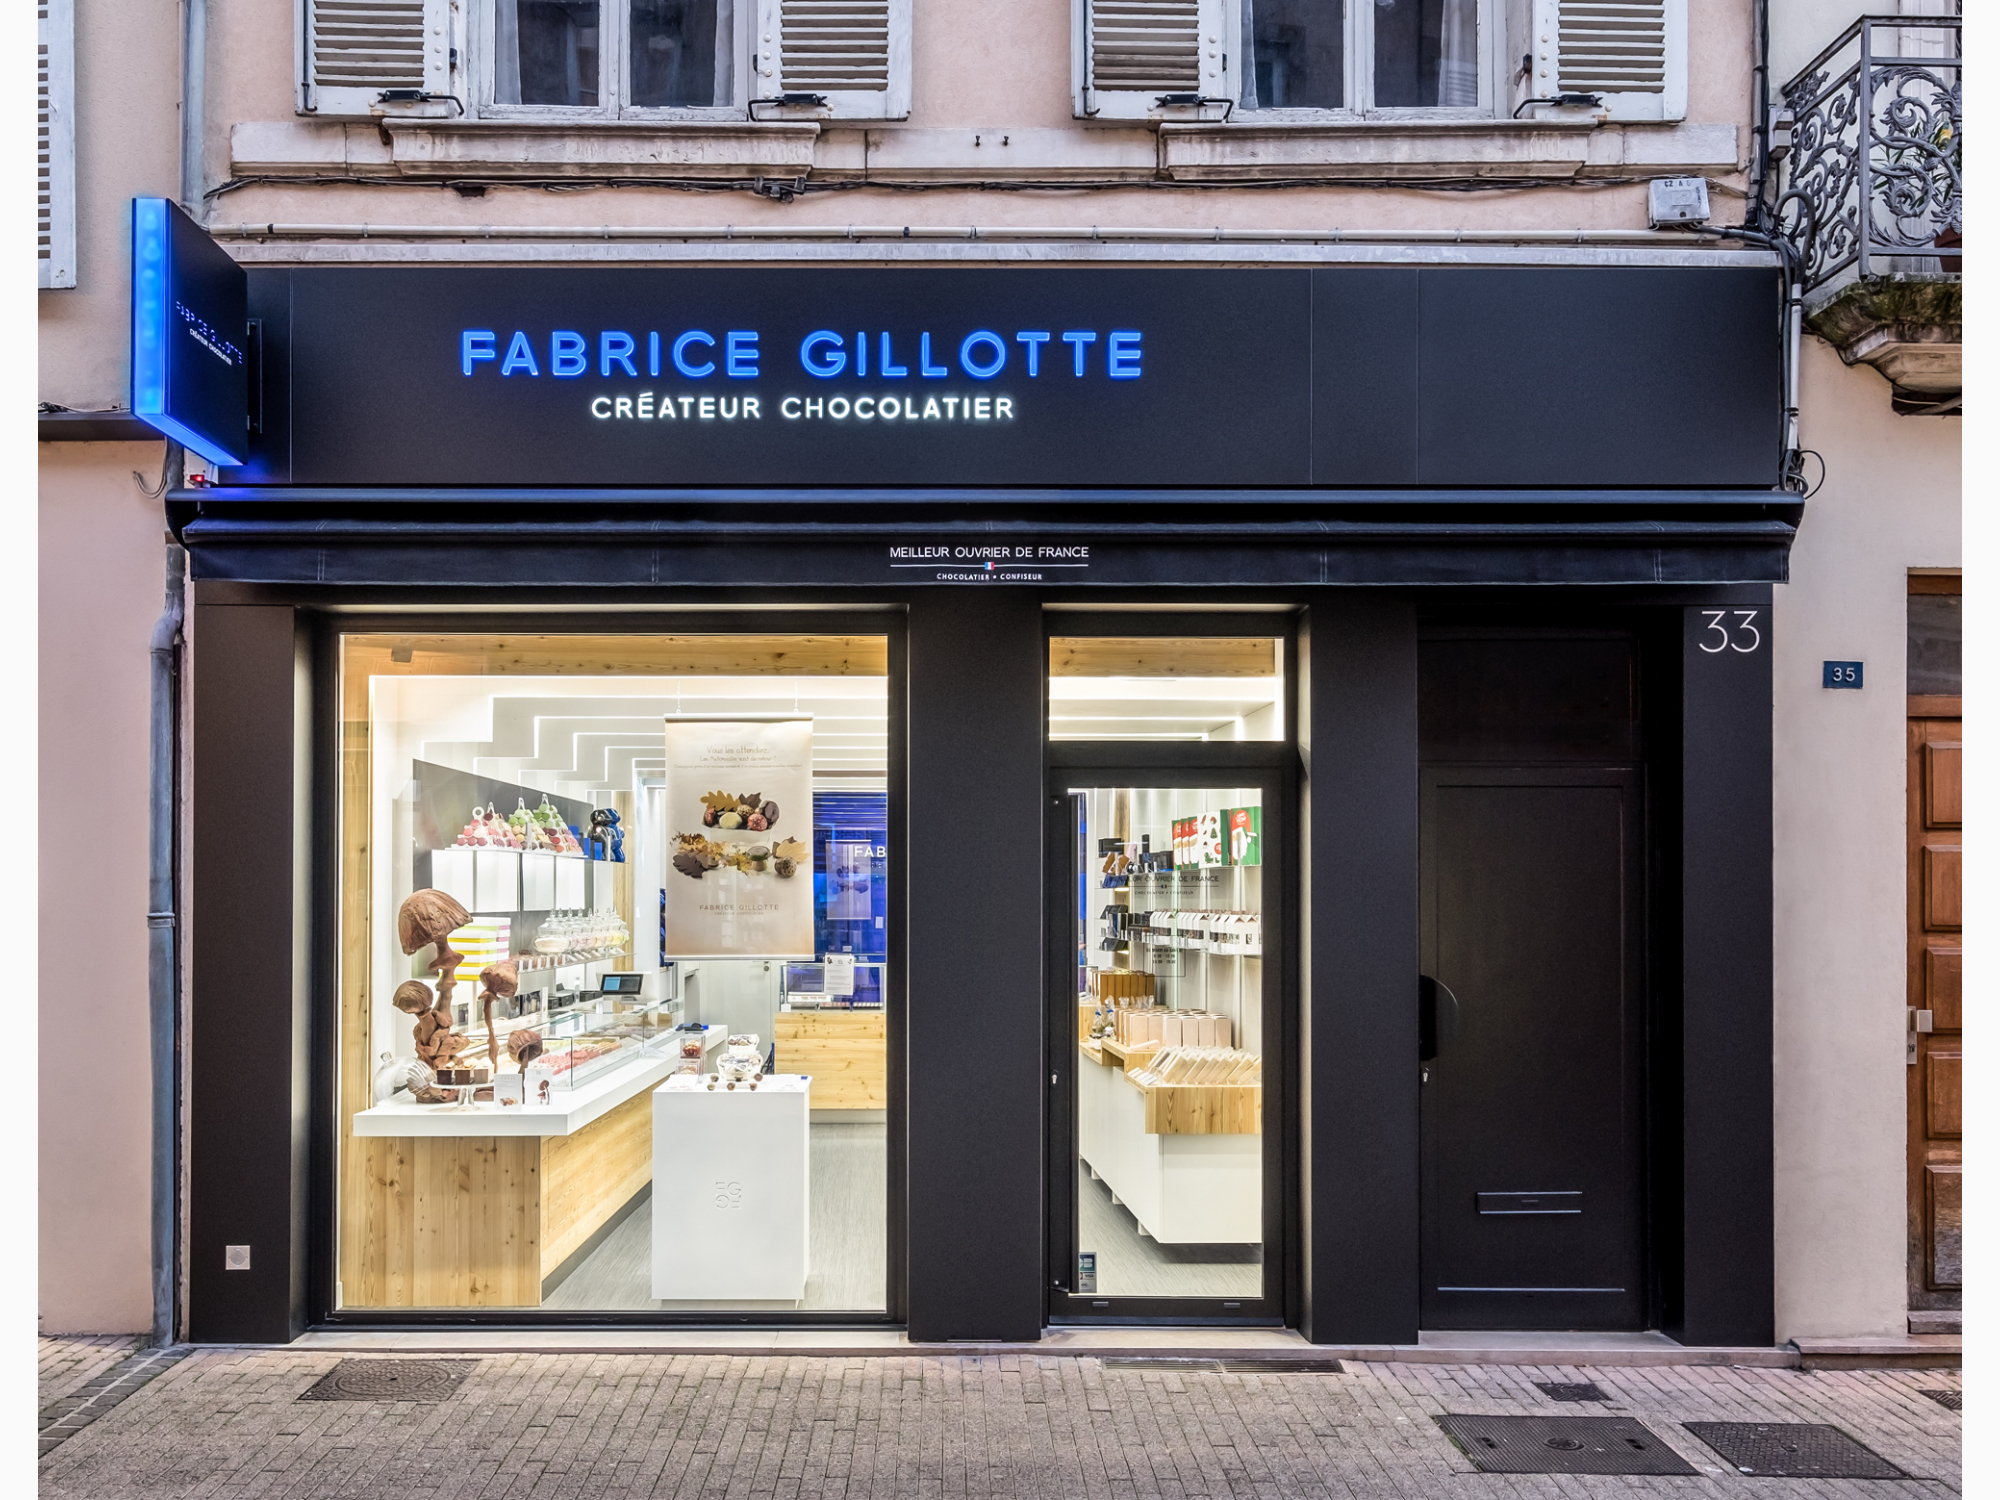 FABRICE GILLOTTE BEAUNE - LES BOUTIQUES - FG Fabrice Gillotte